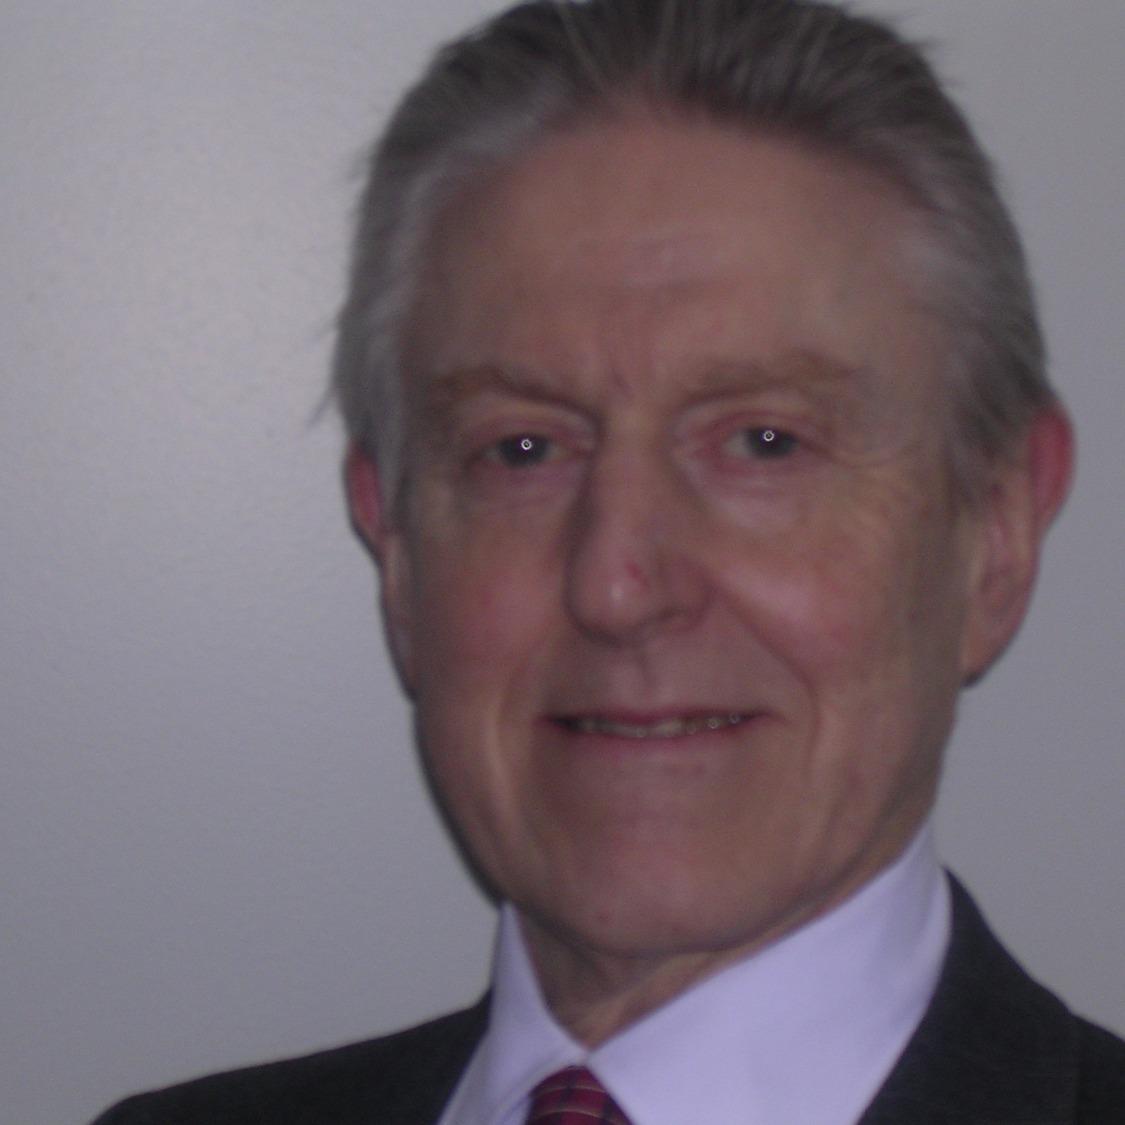 Paul J. Foont